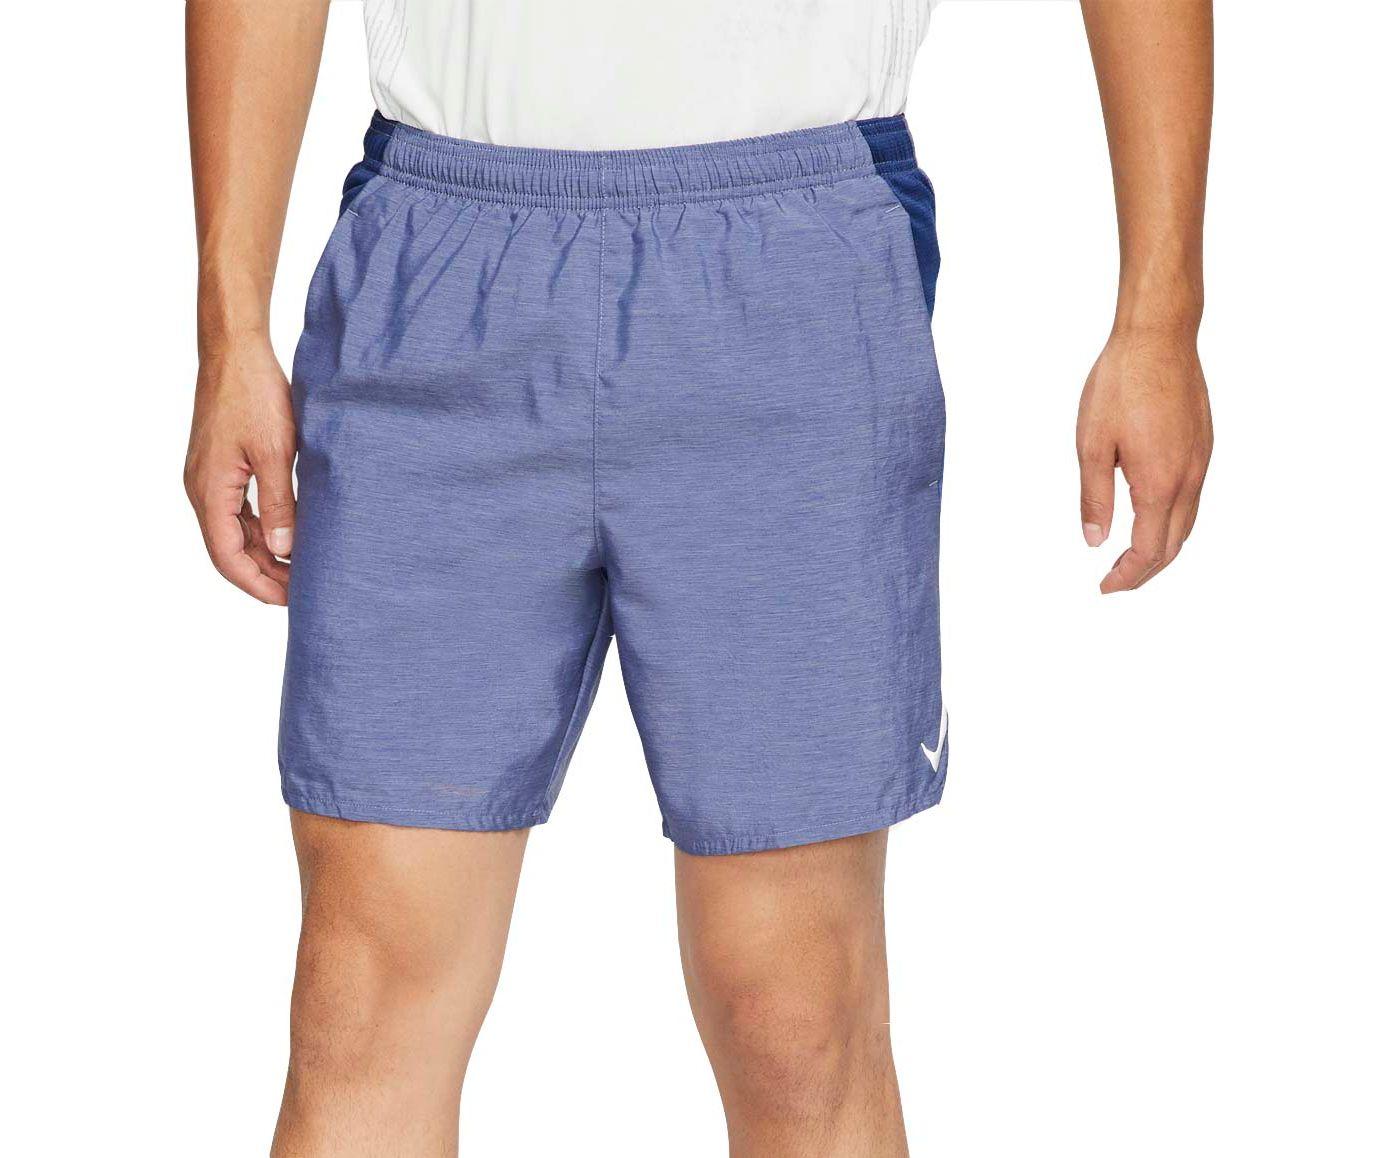 Nike Men's Challenger Dri-FIT 7'' Running Shorts